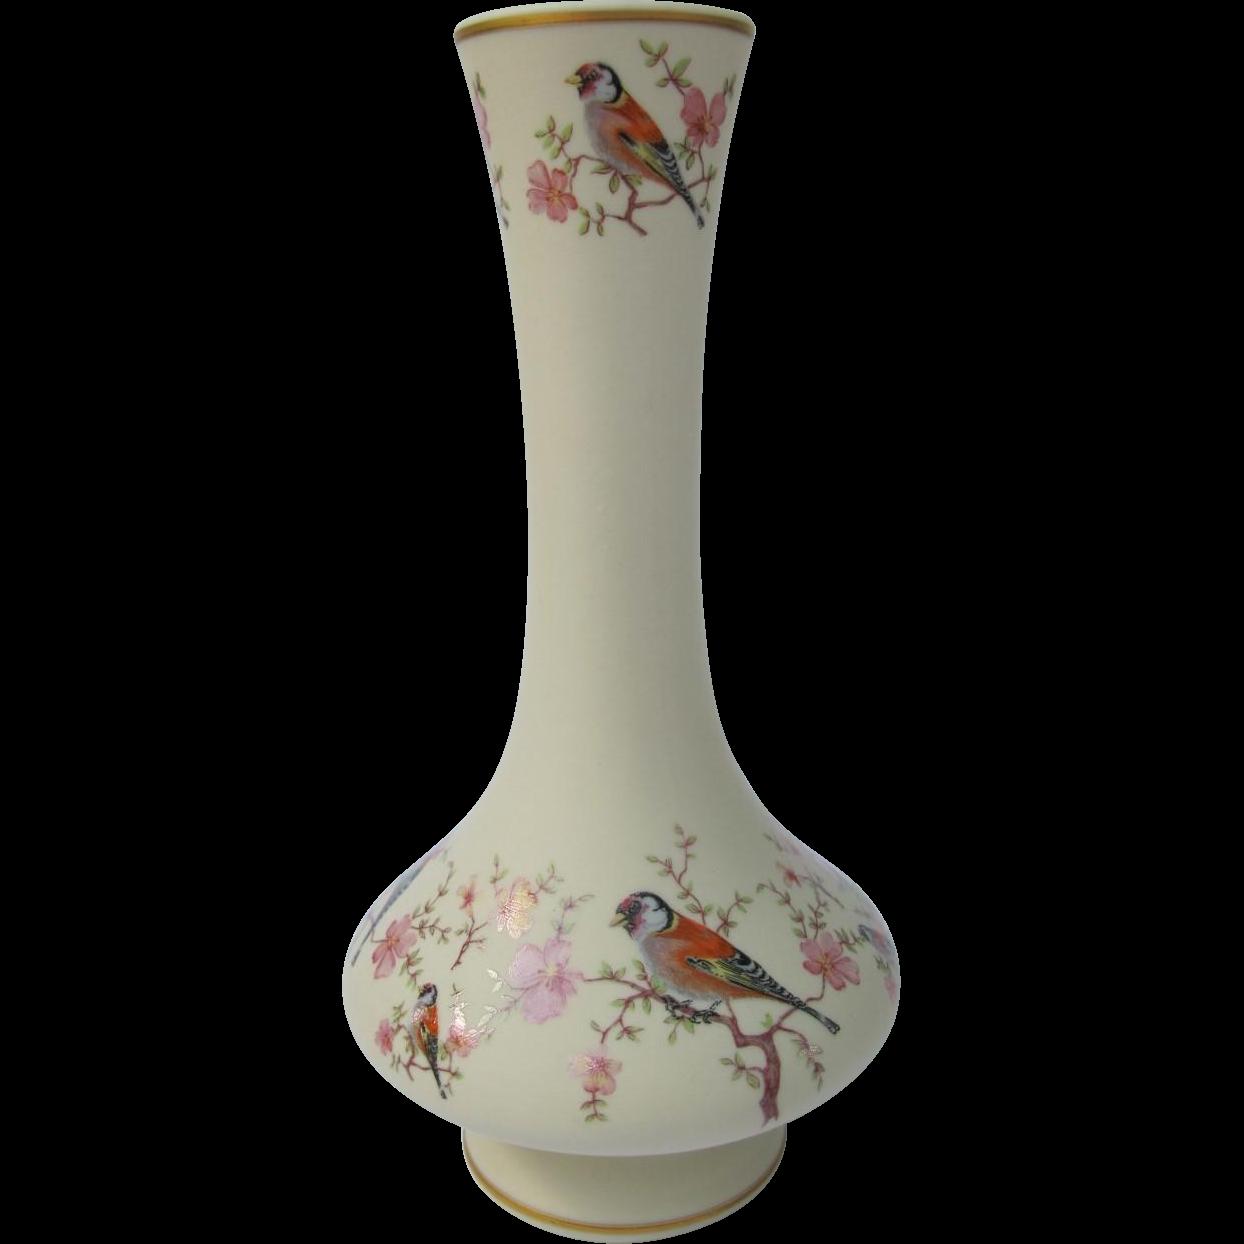 Vintage European Goldfinch Vase from Portugal